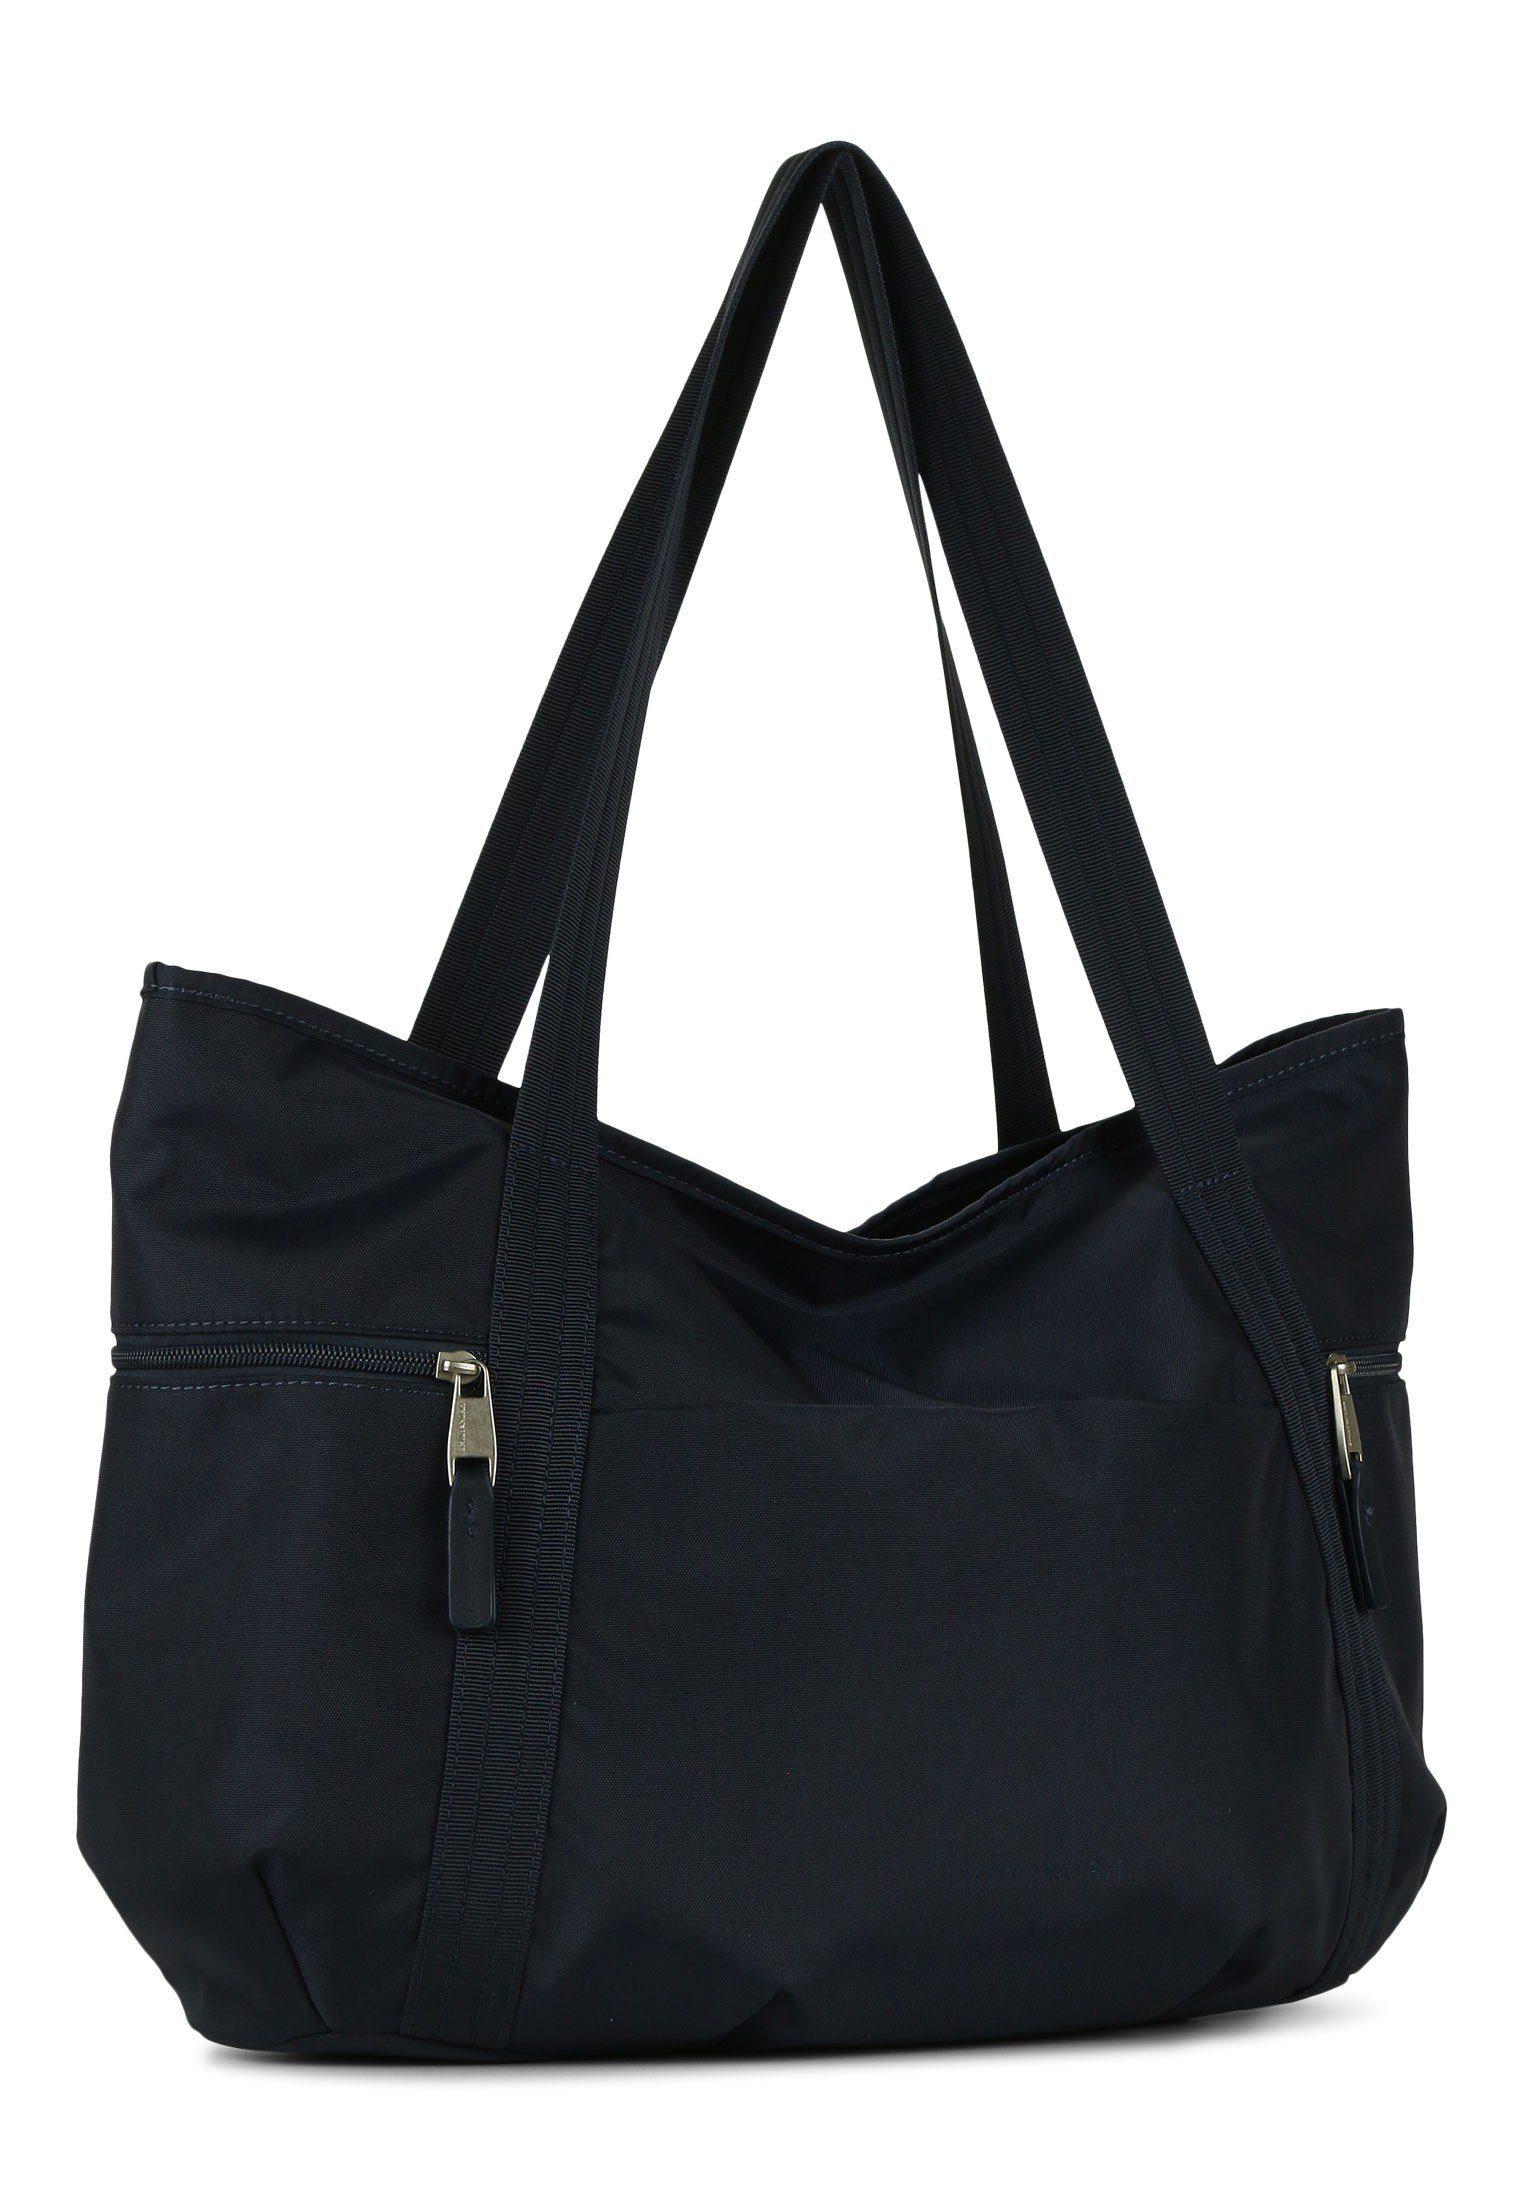 2 Kaufen Shopper Pina 3981092999 amp; Noah Artikel Emily nr Online No 4wqI10S